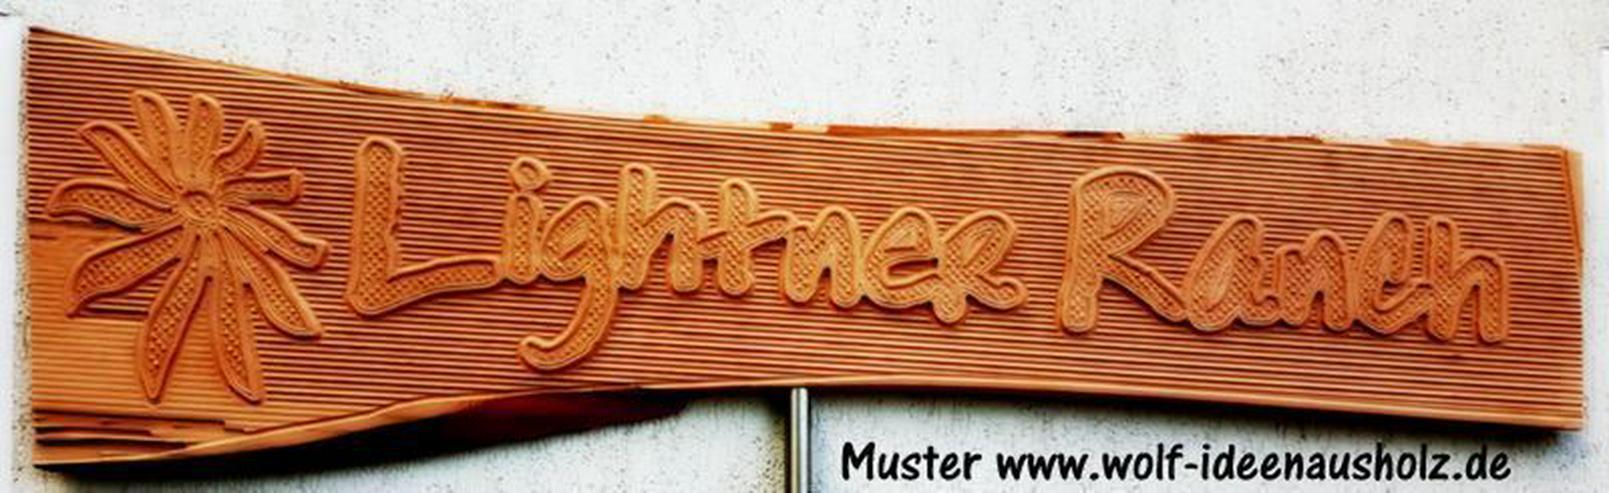 rustikale Holzschilder